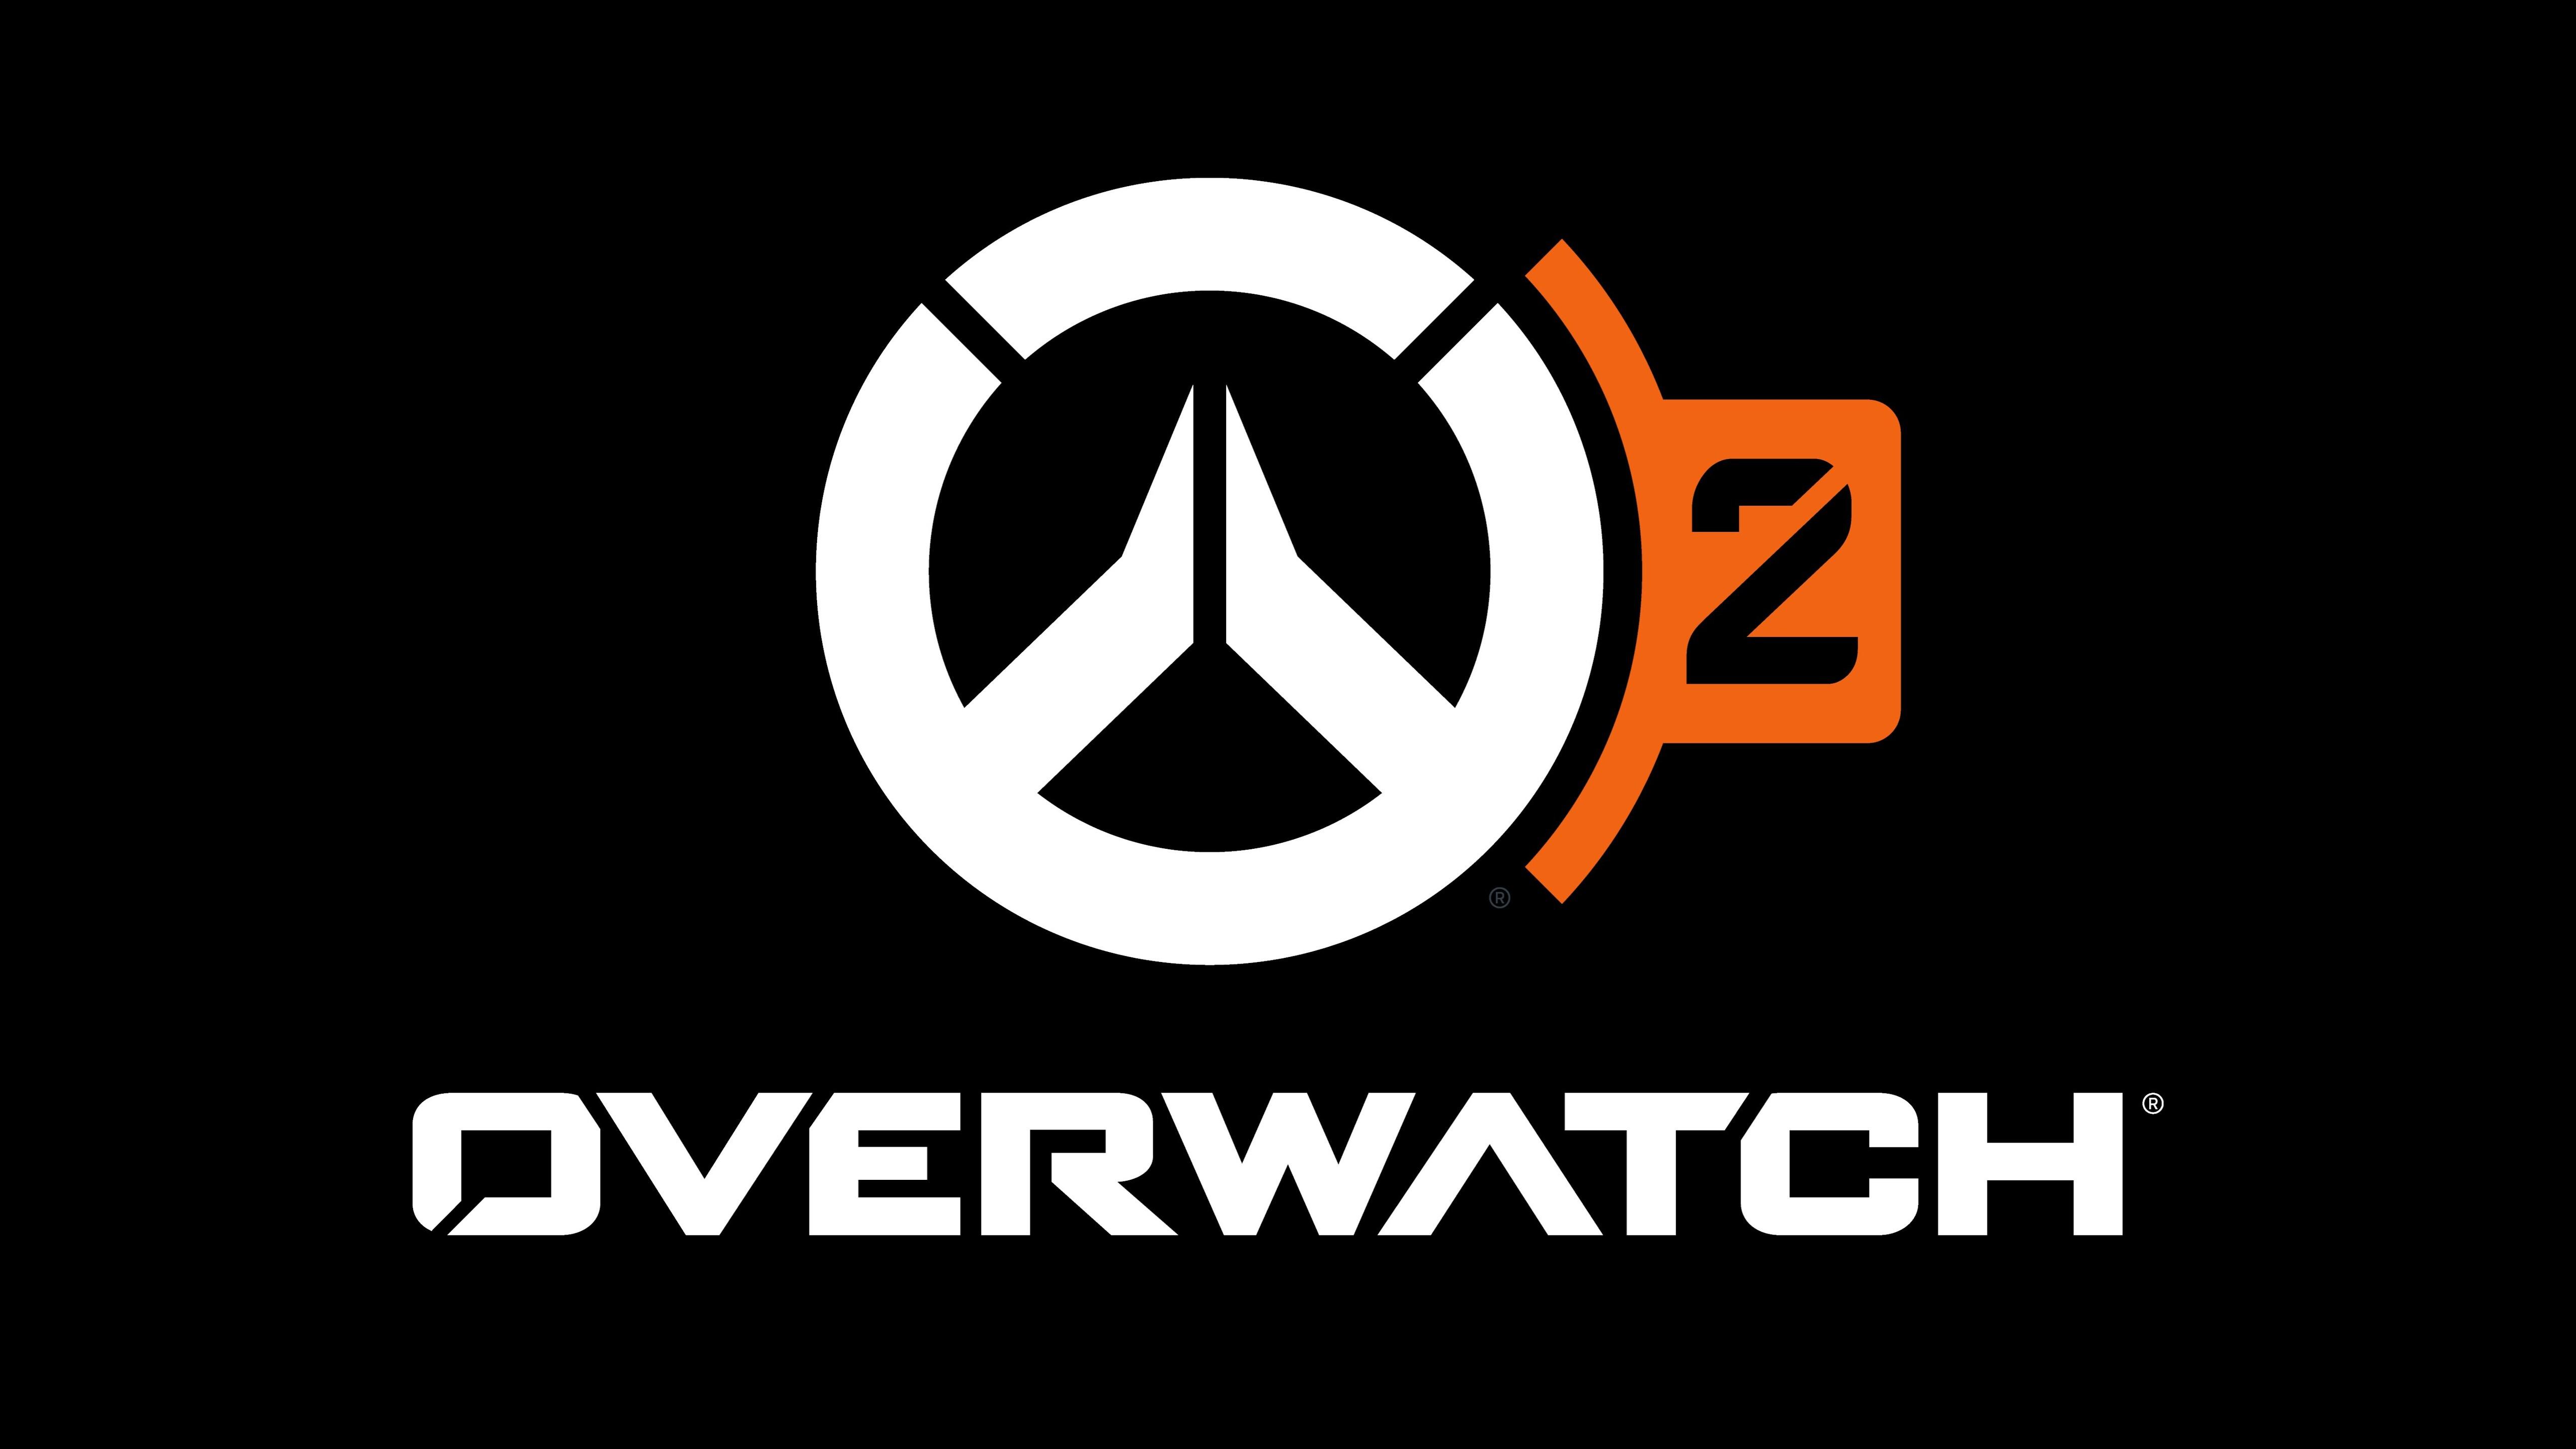 overwatch-2-game-logo-5k-lg.jpg